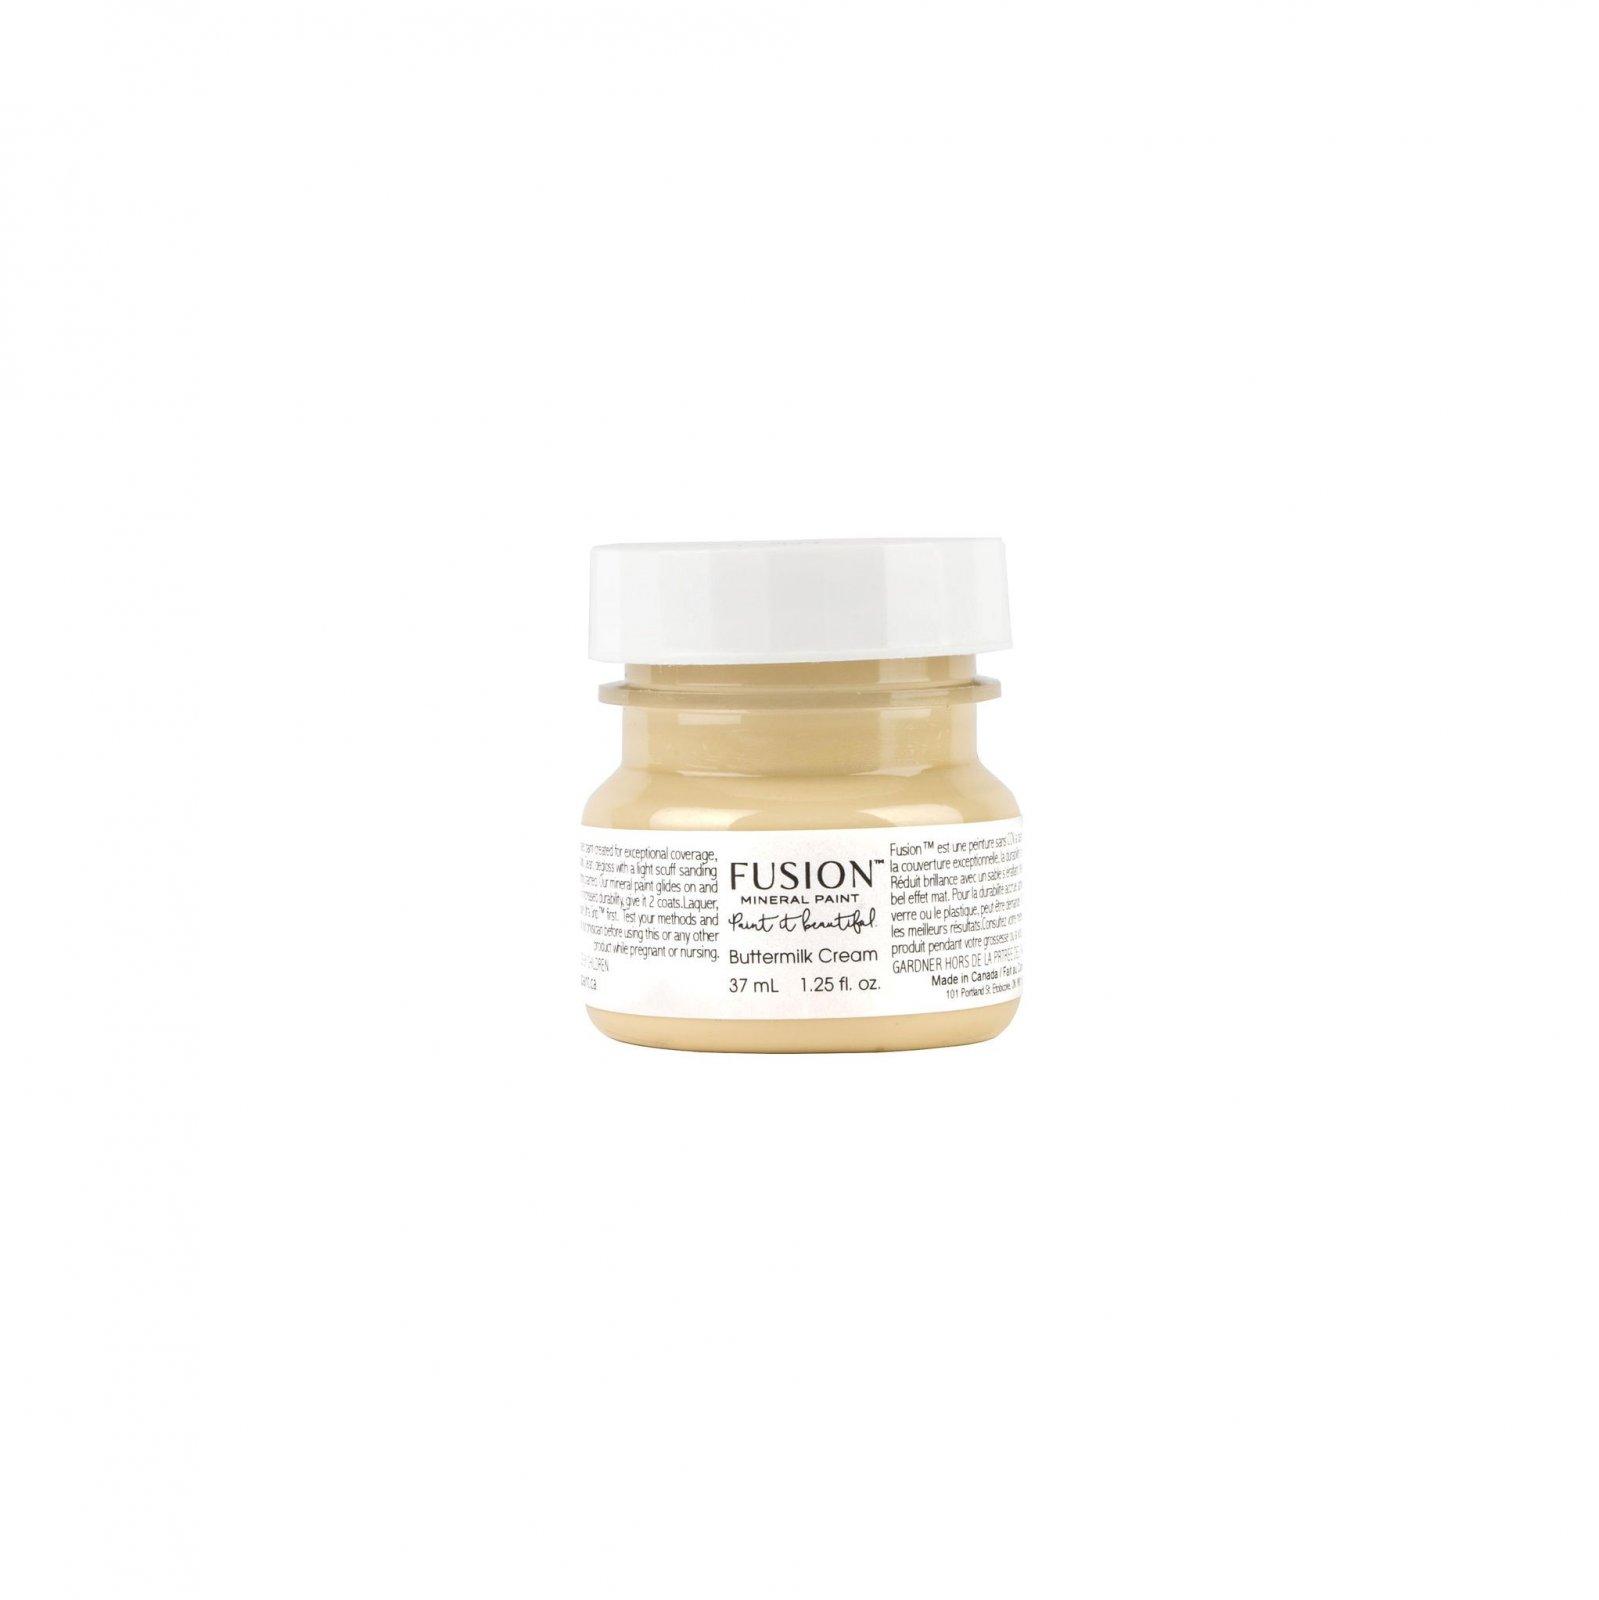 Buttermilk Cream Tester Fusion Mineral Paint